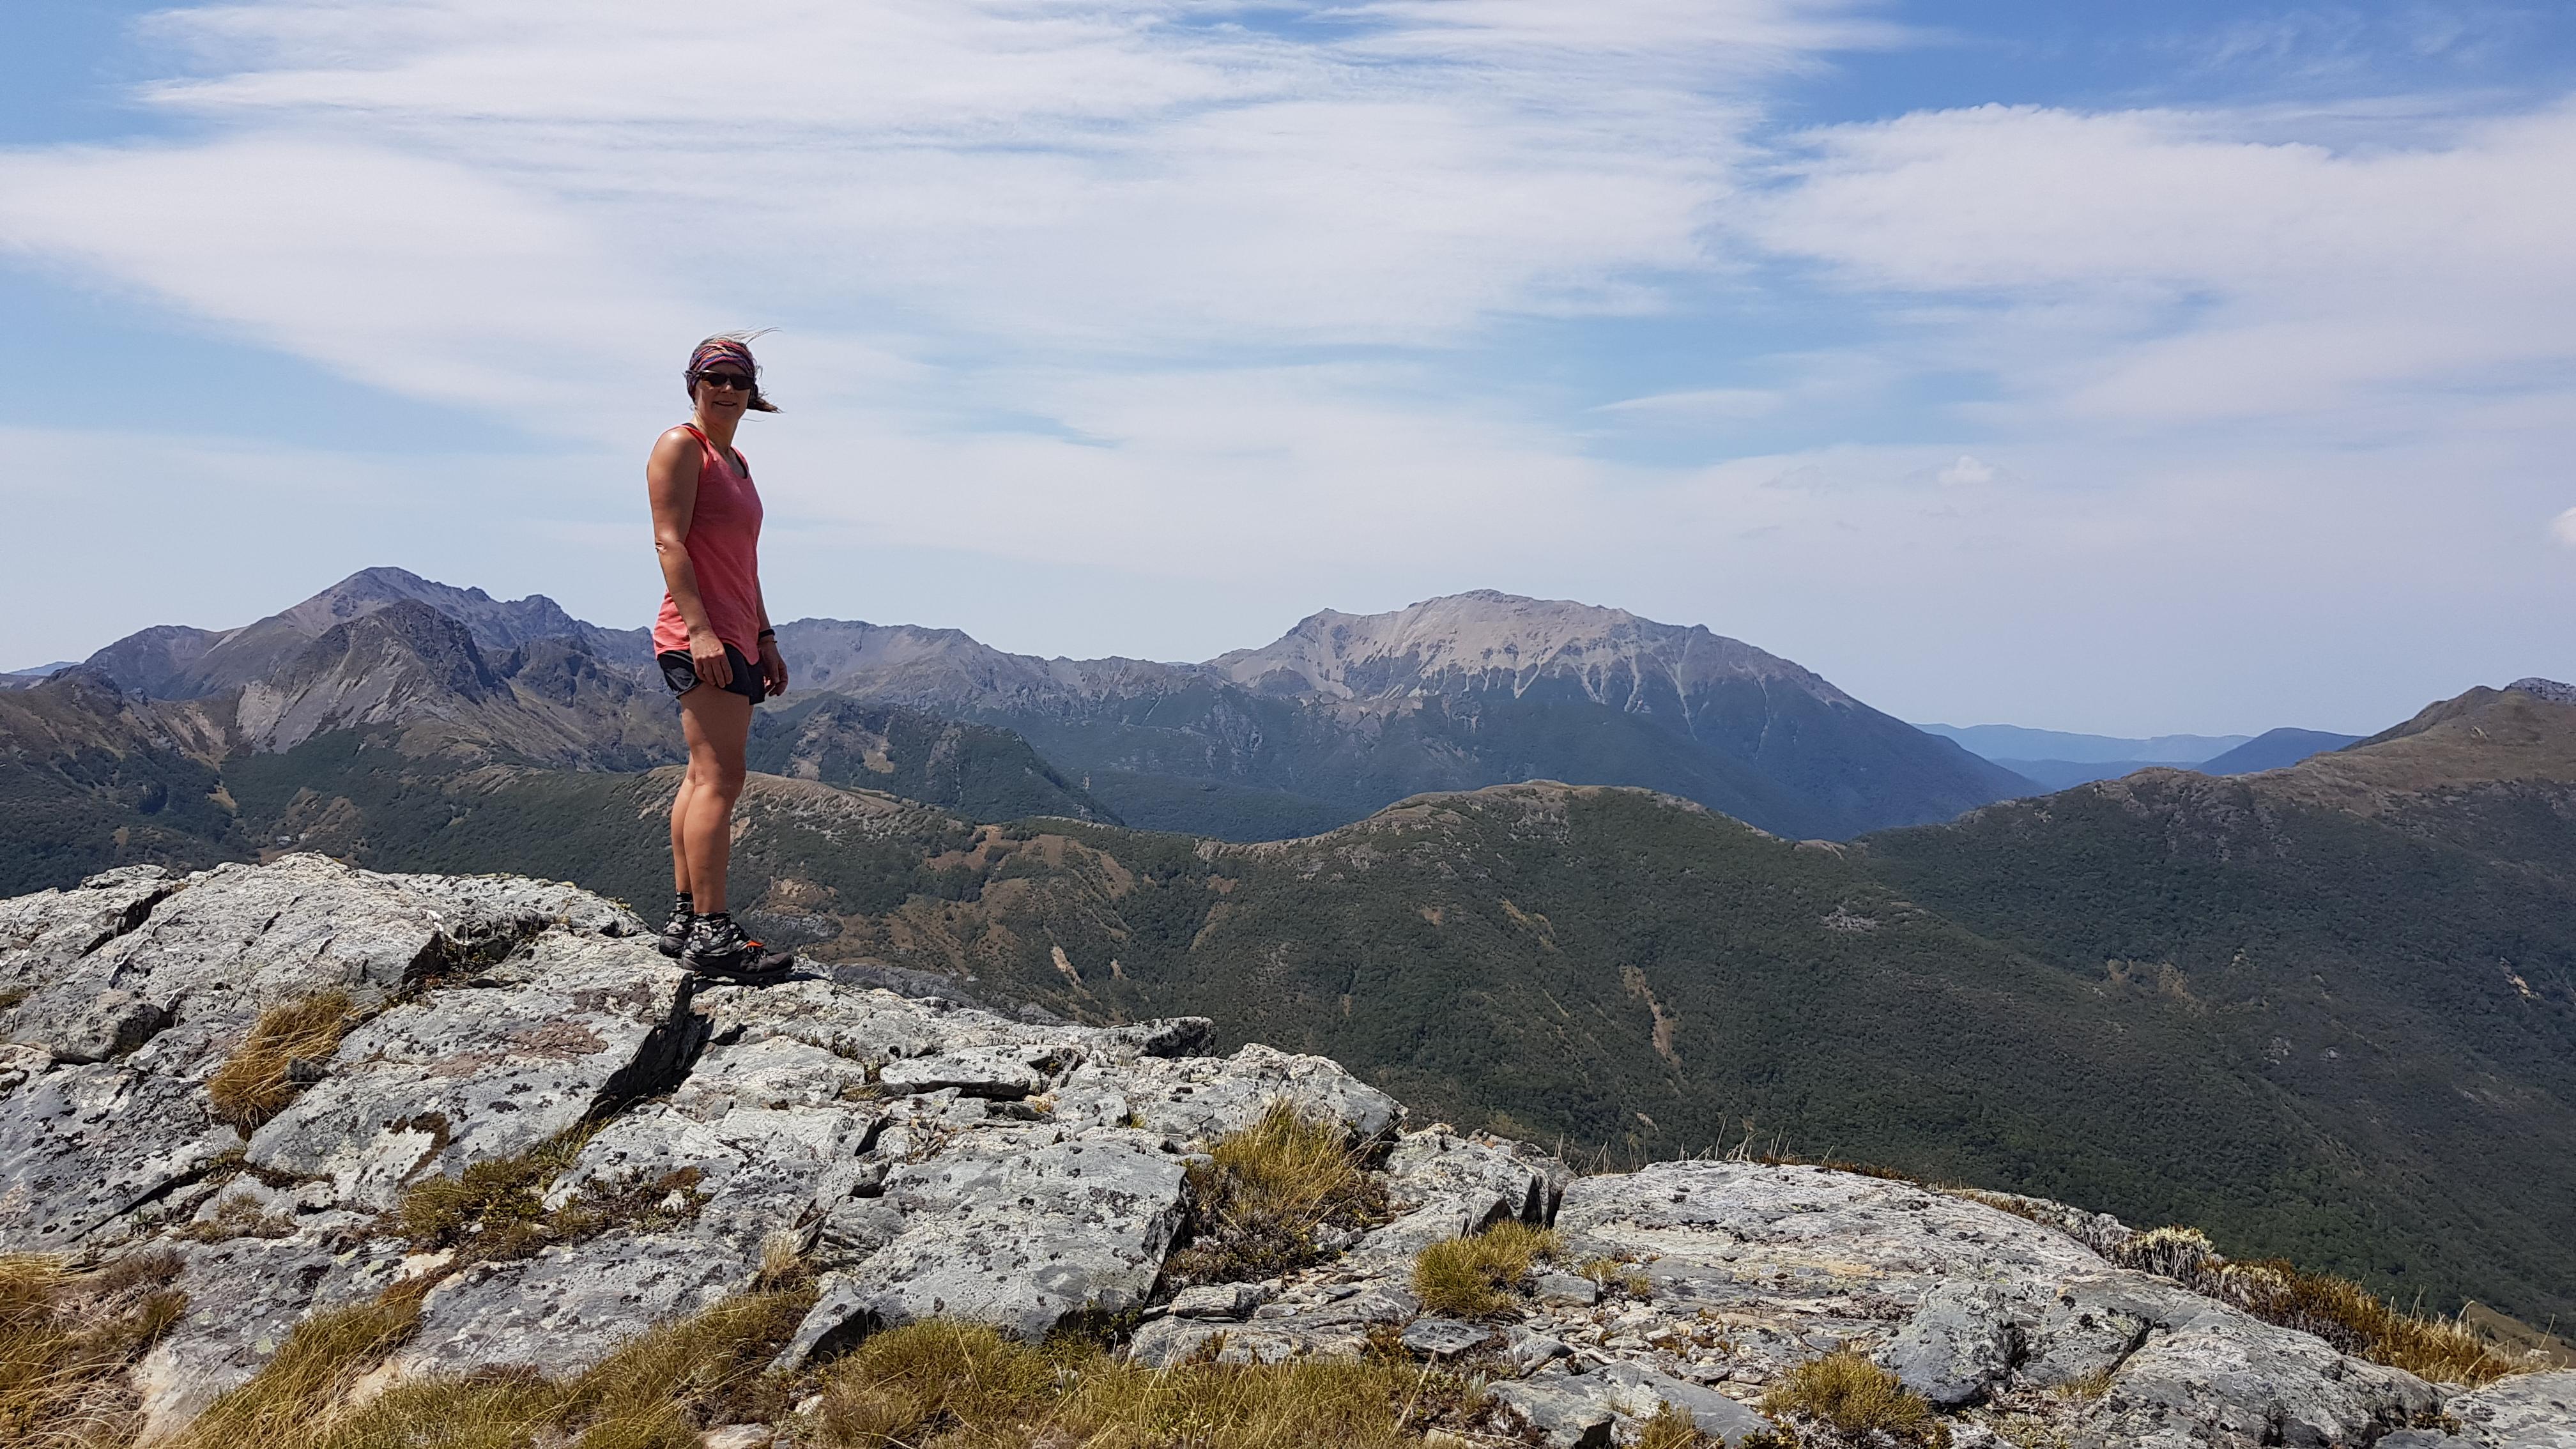 Enjoying the views across to the Lockett Range from the Peel Range